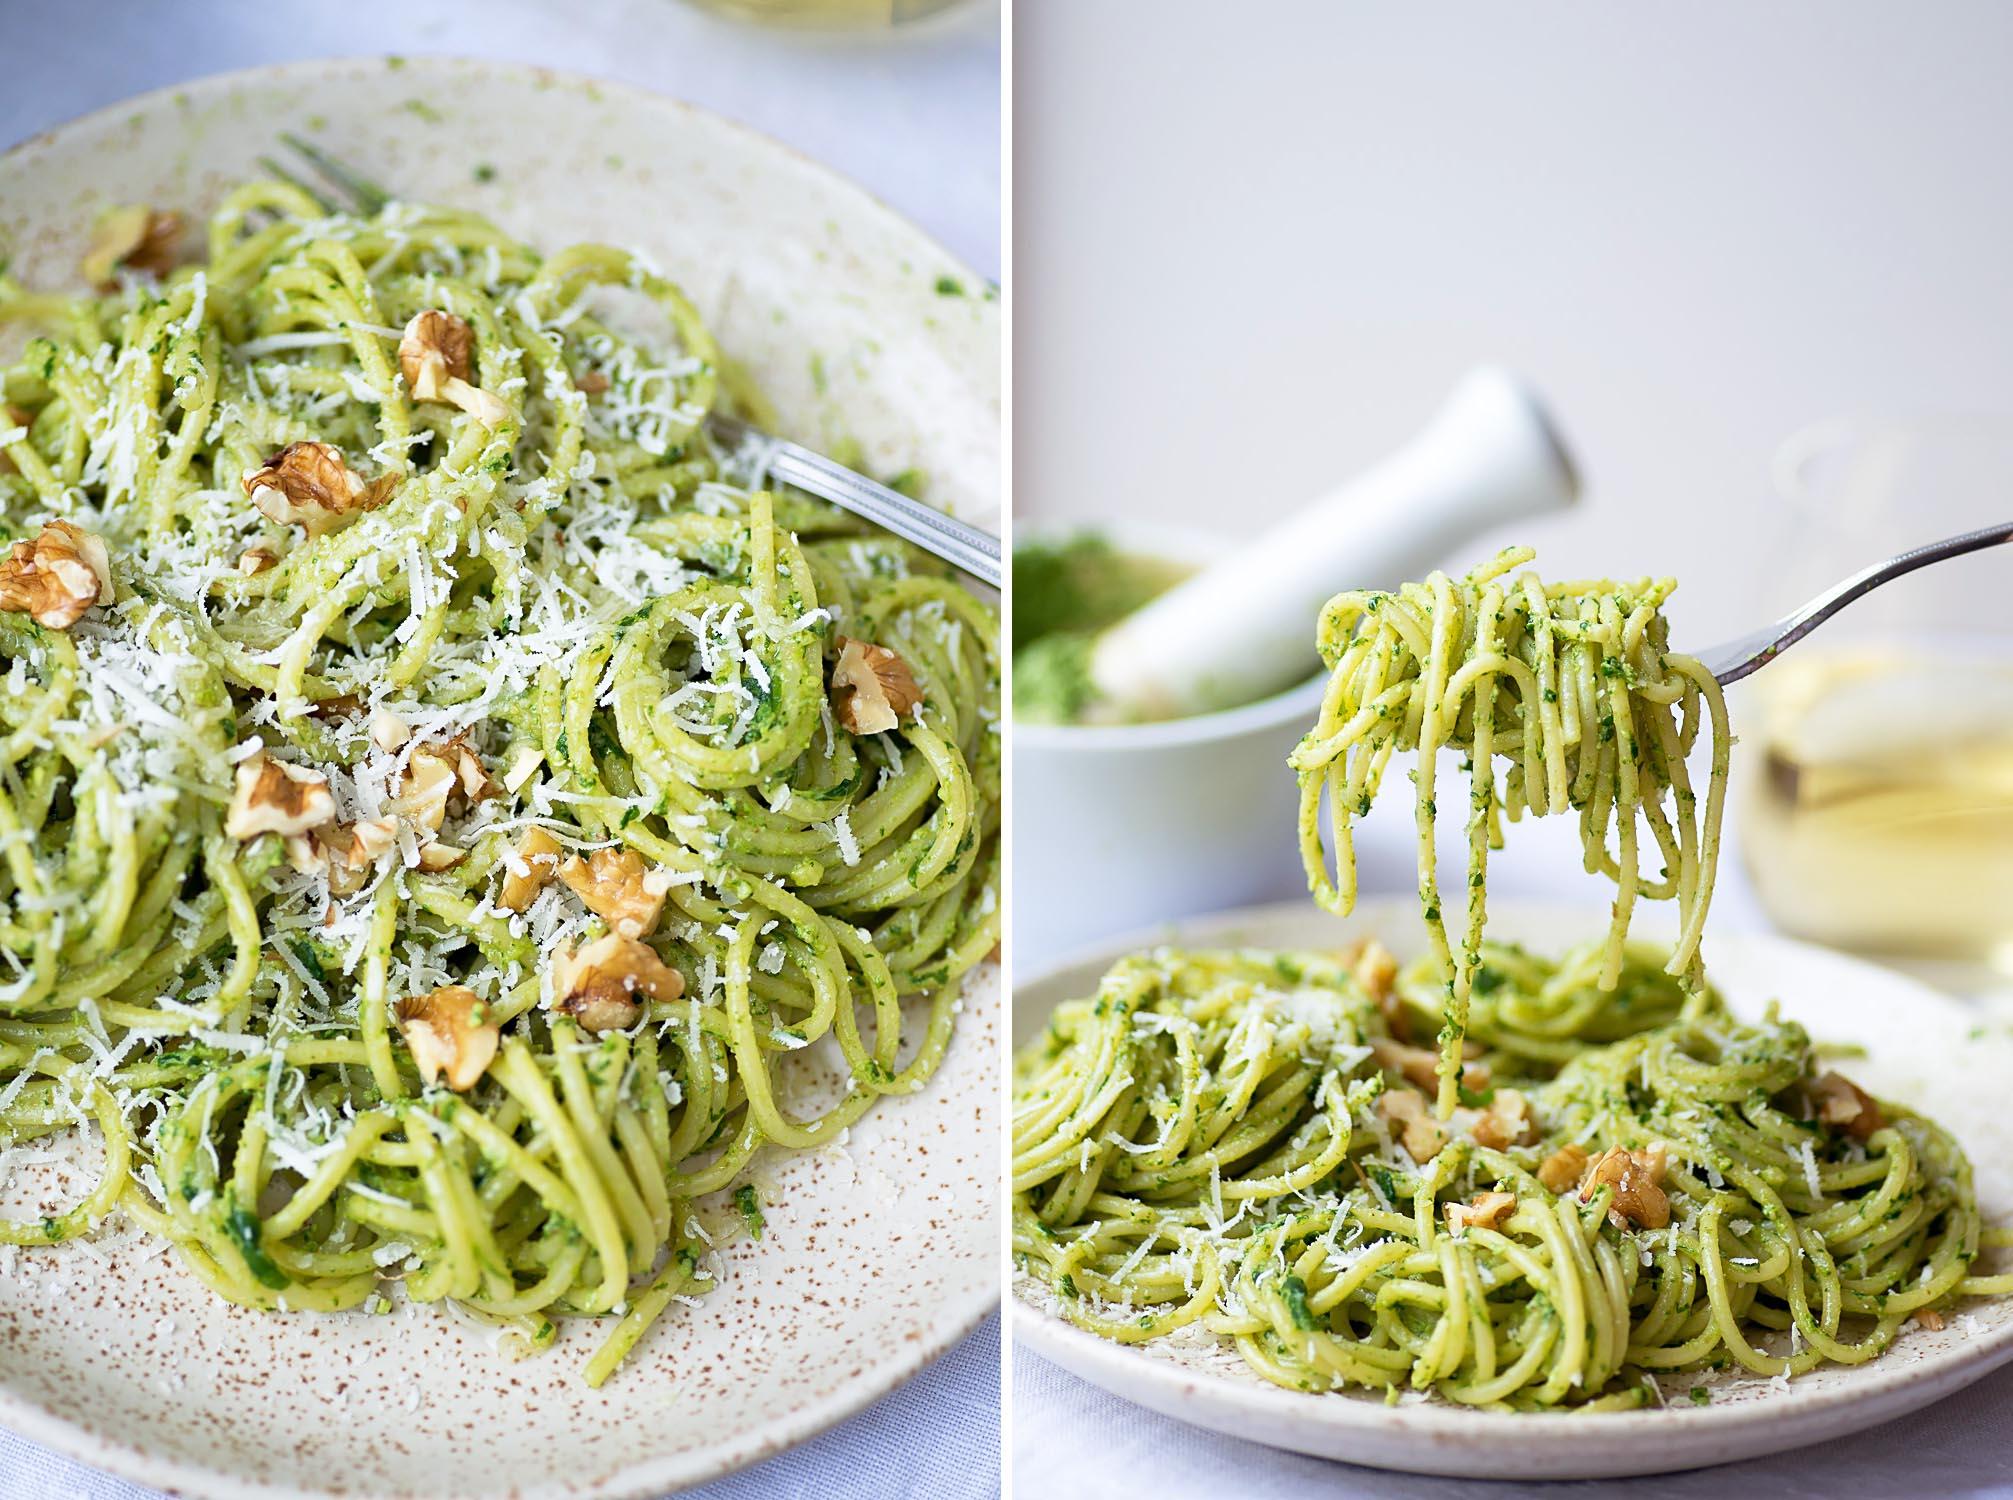 "Spaghetti with Rocket and Walnut Pesto <div class=""hrecipe jetpack-recipe"" itemscope itemtype=""https://schema.org/Recipe""><div class=""jetpack-recipe-content""></div></div>"